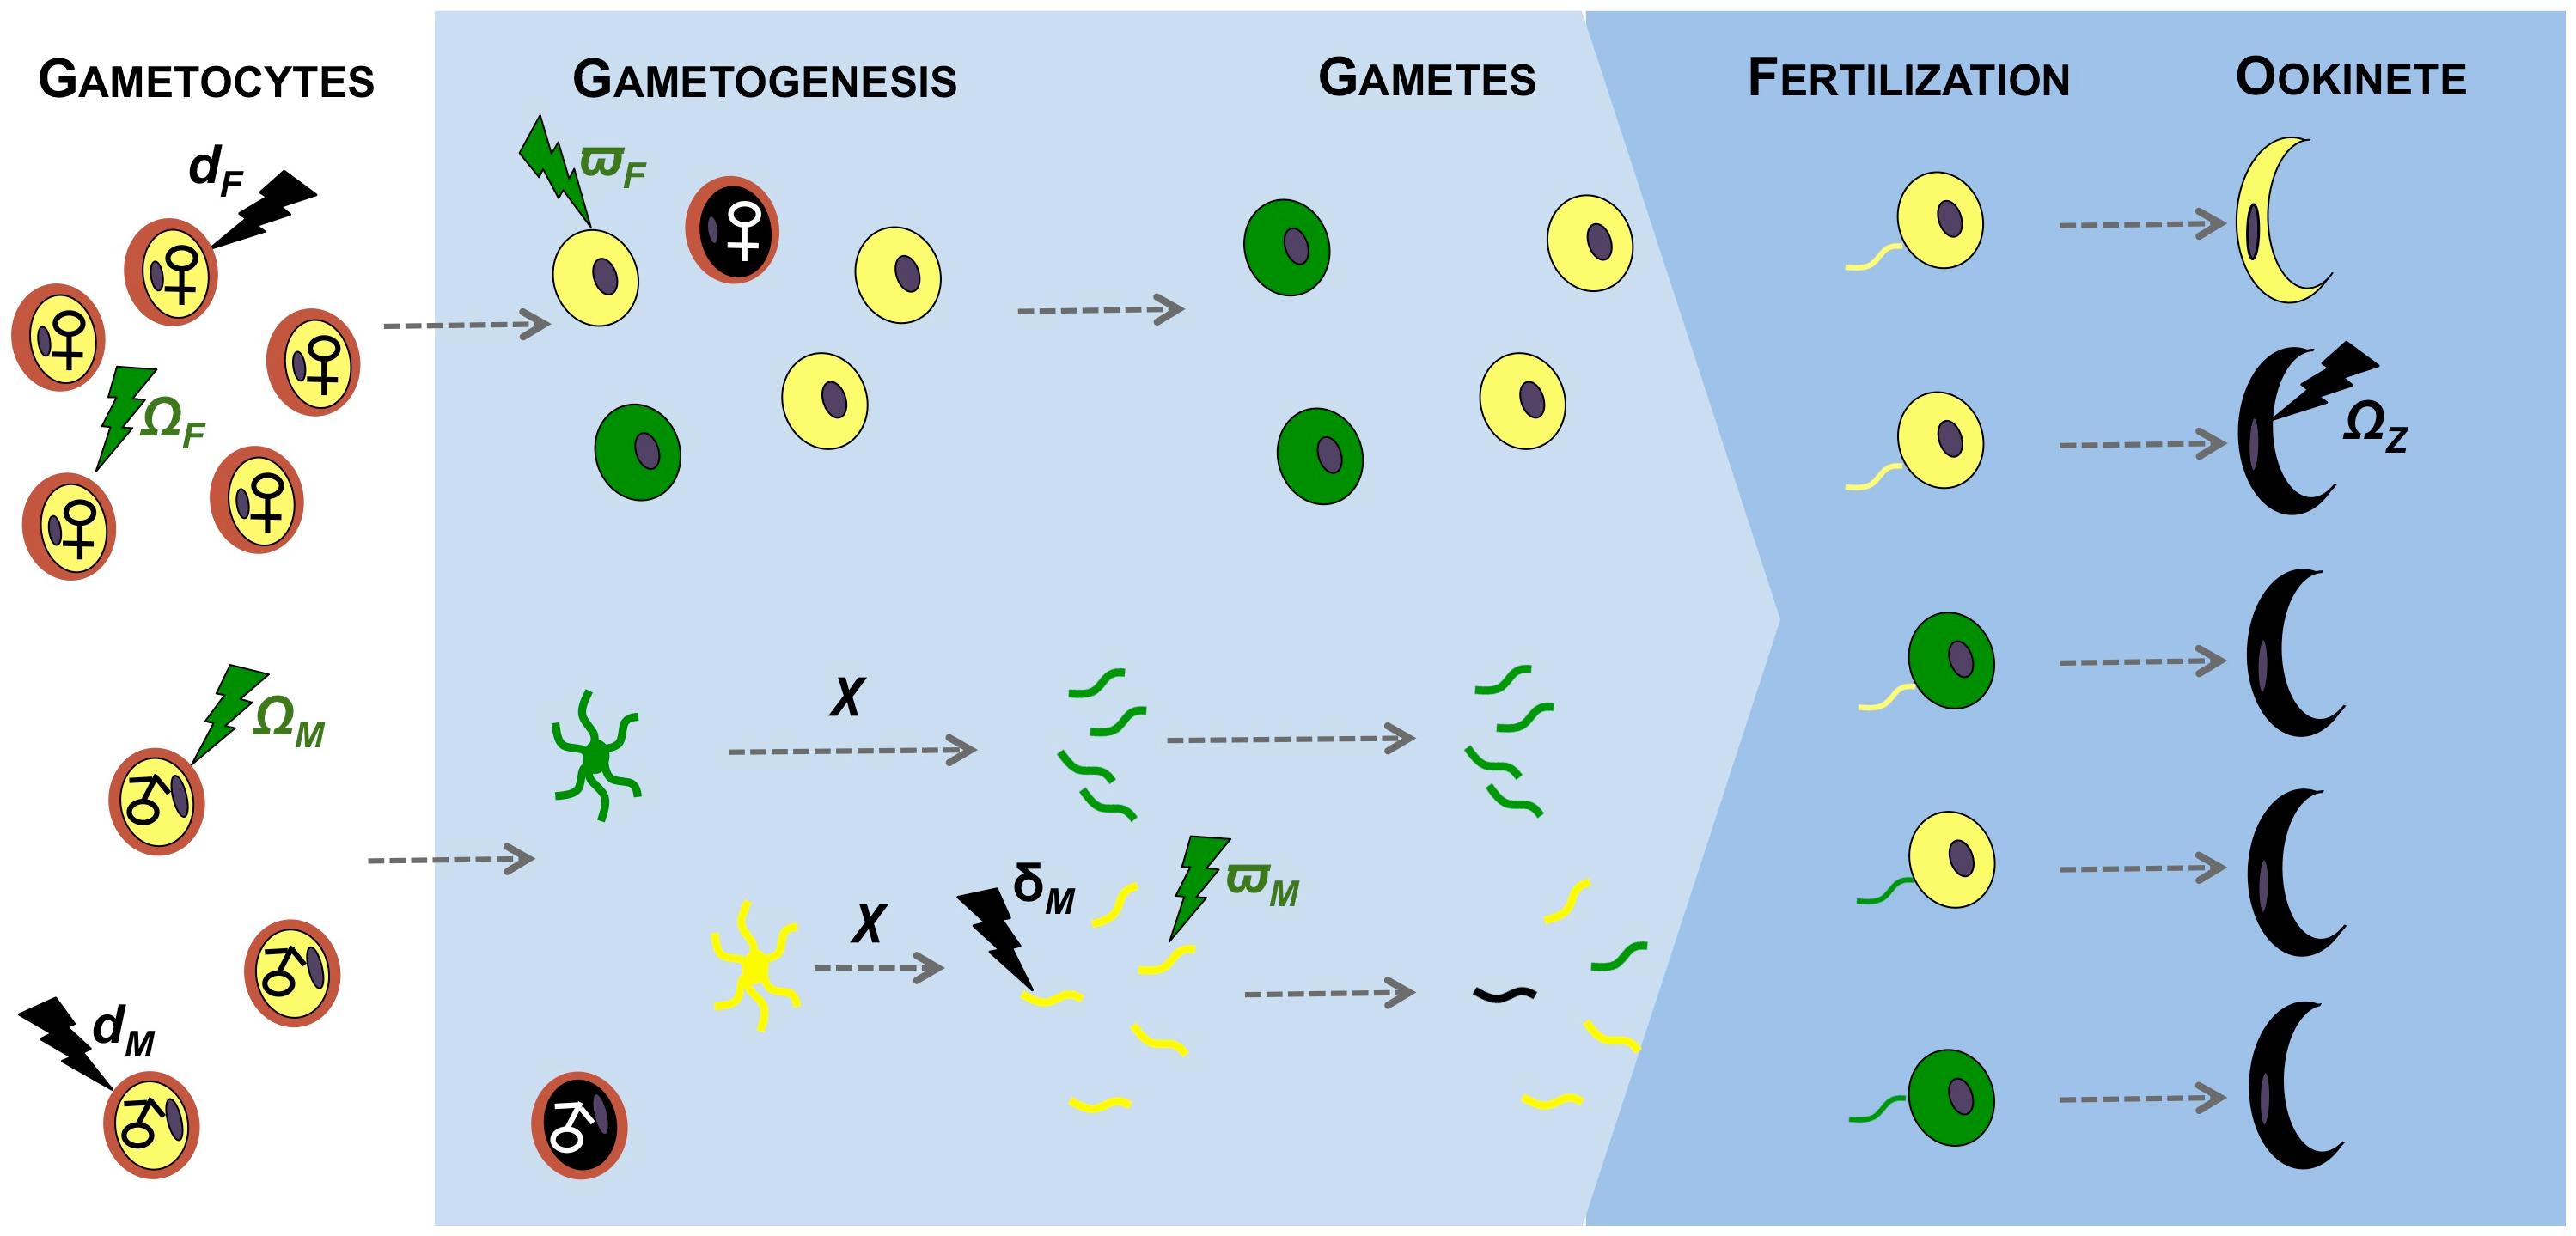 Effects of immunity on gametogenesis and fertility of malaria parasites.